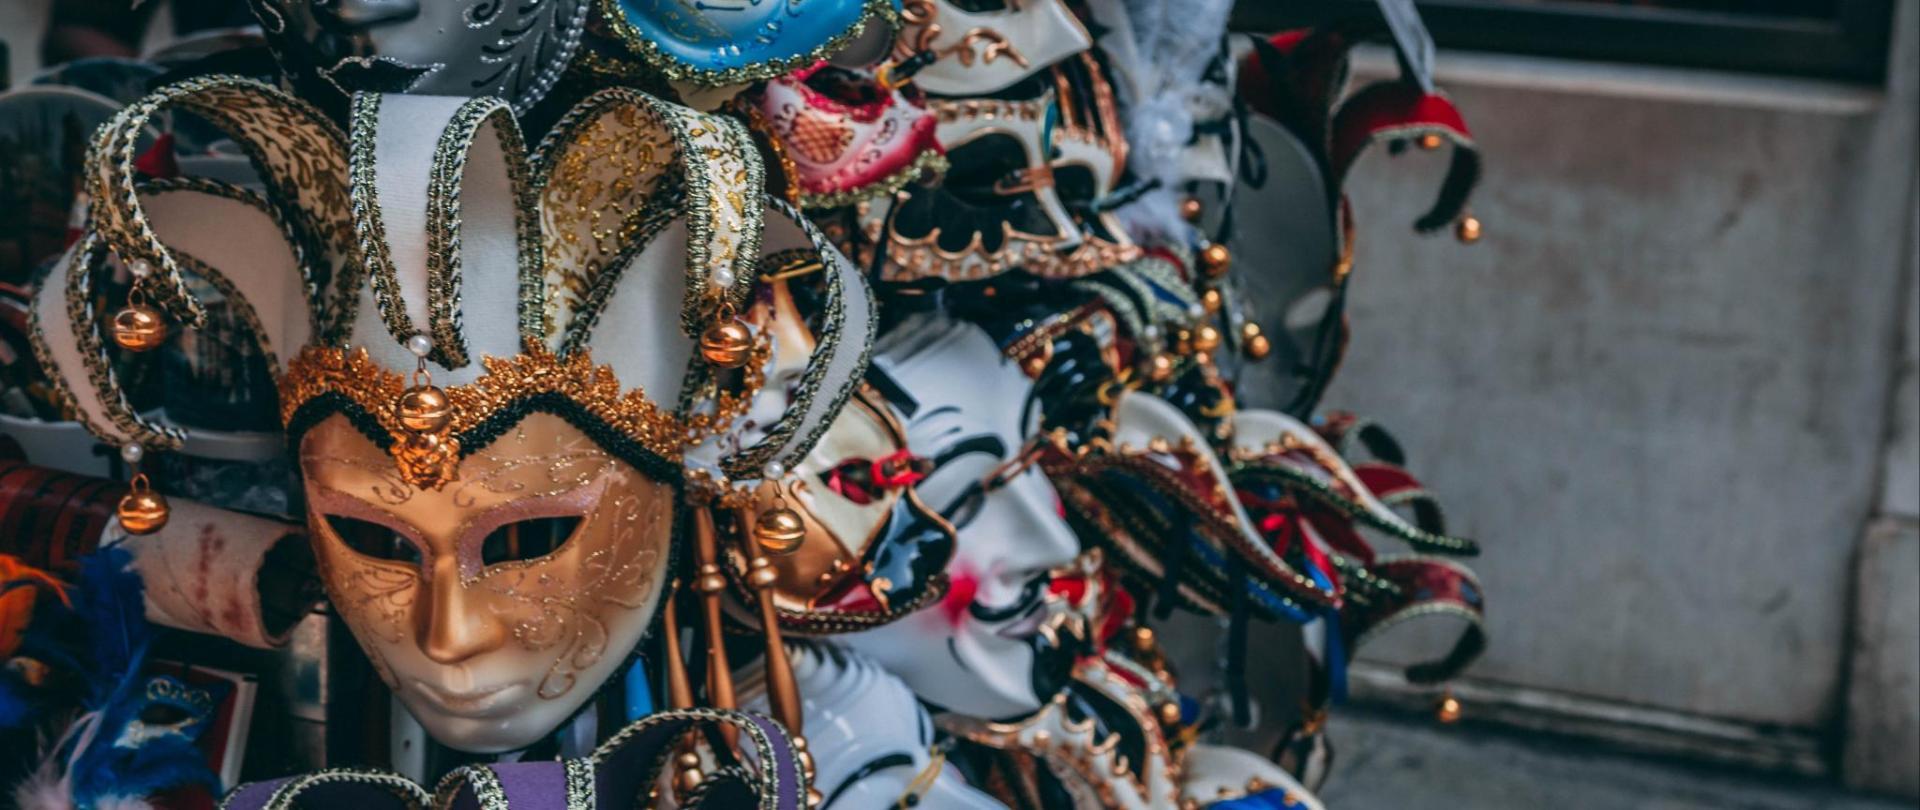 art-close-up-costume-1144283.jpg